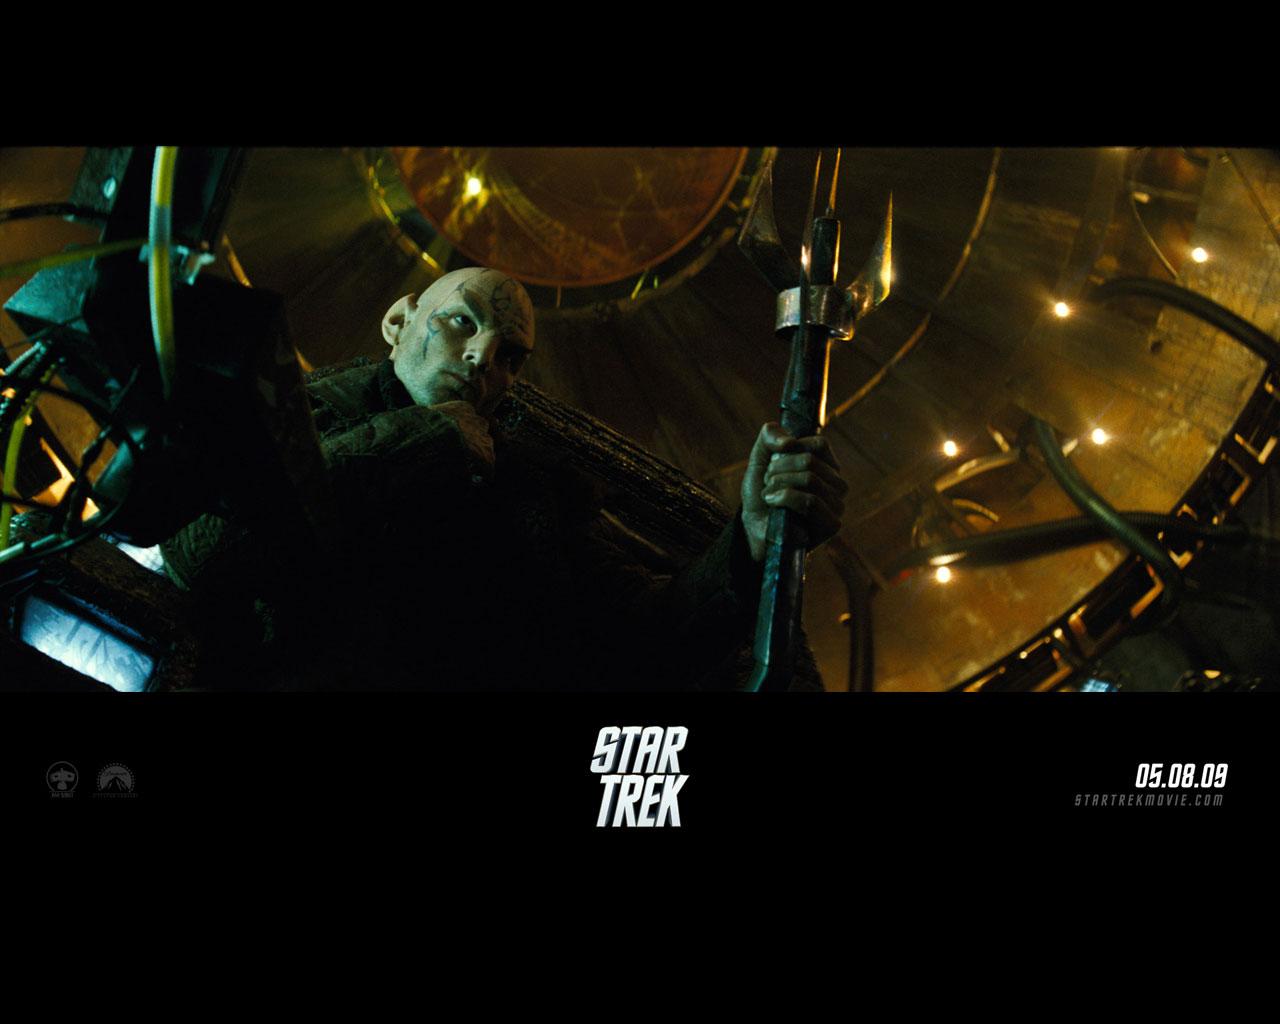 Star Trek 2009 Wallpaper 1280x1024 star trek 2009 1280x1024